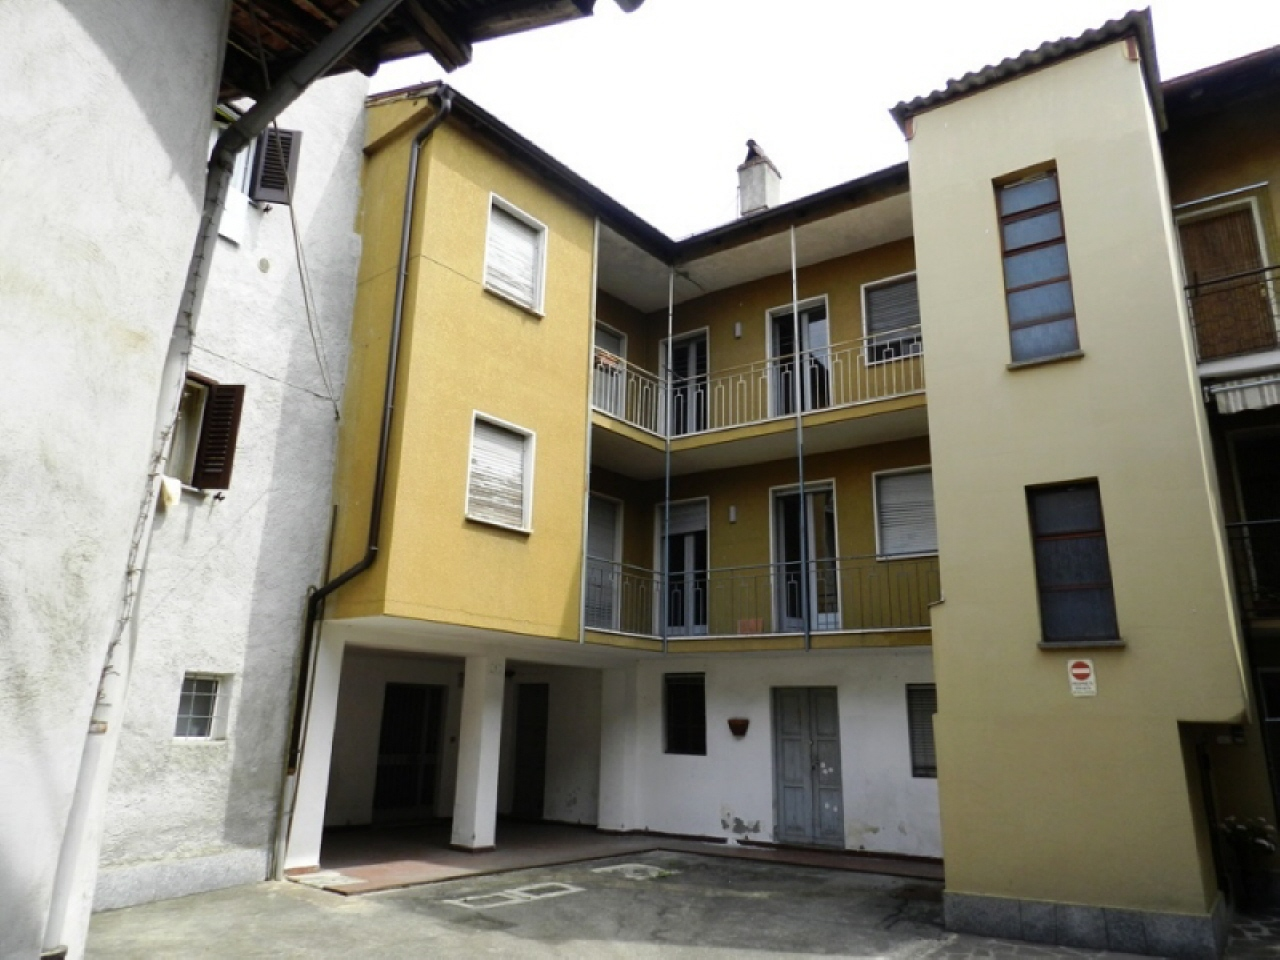 Vendita Villetta Bifamiliare Casa/Villa Luino via sentirolo 77340